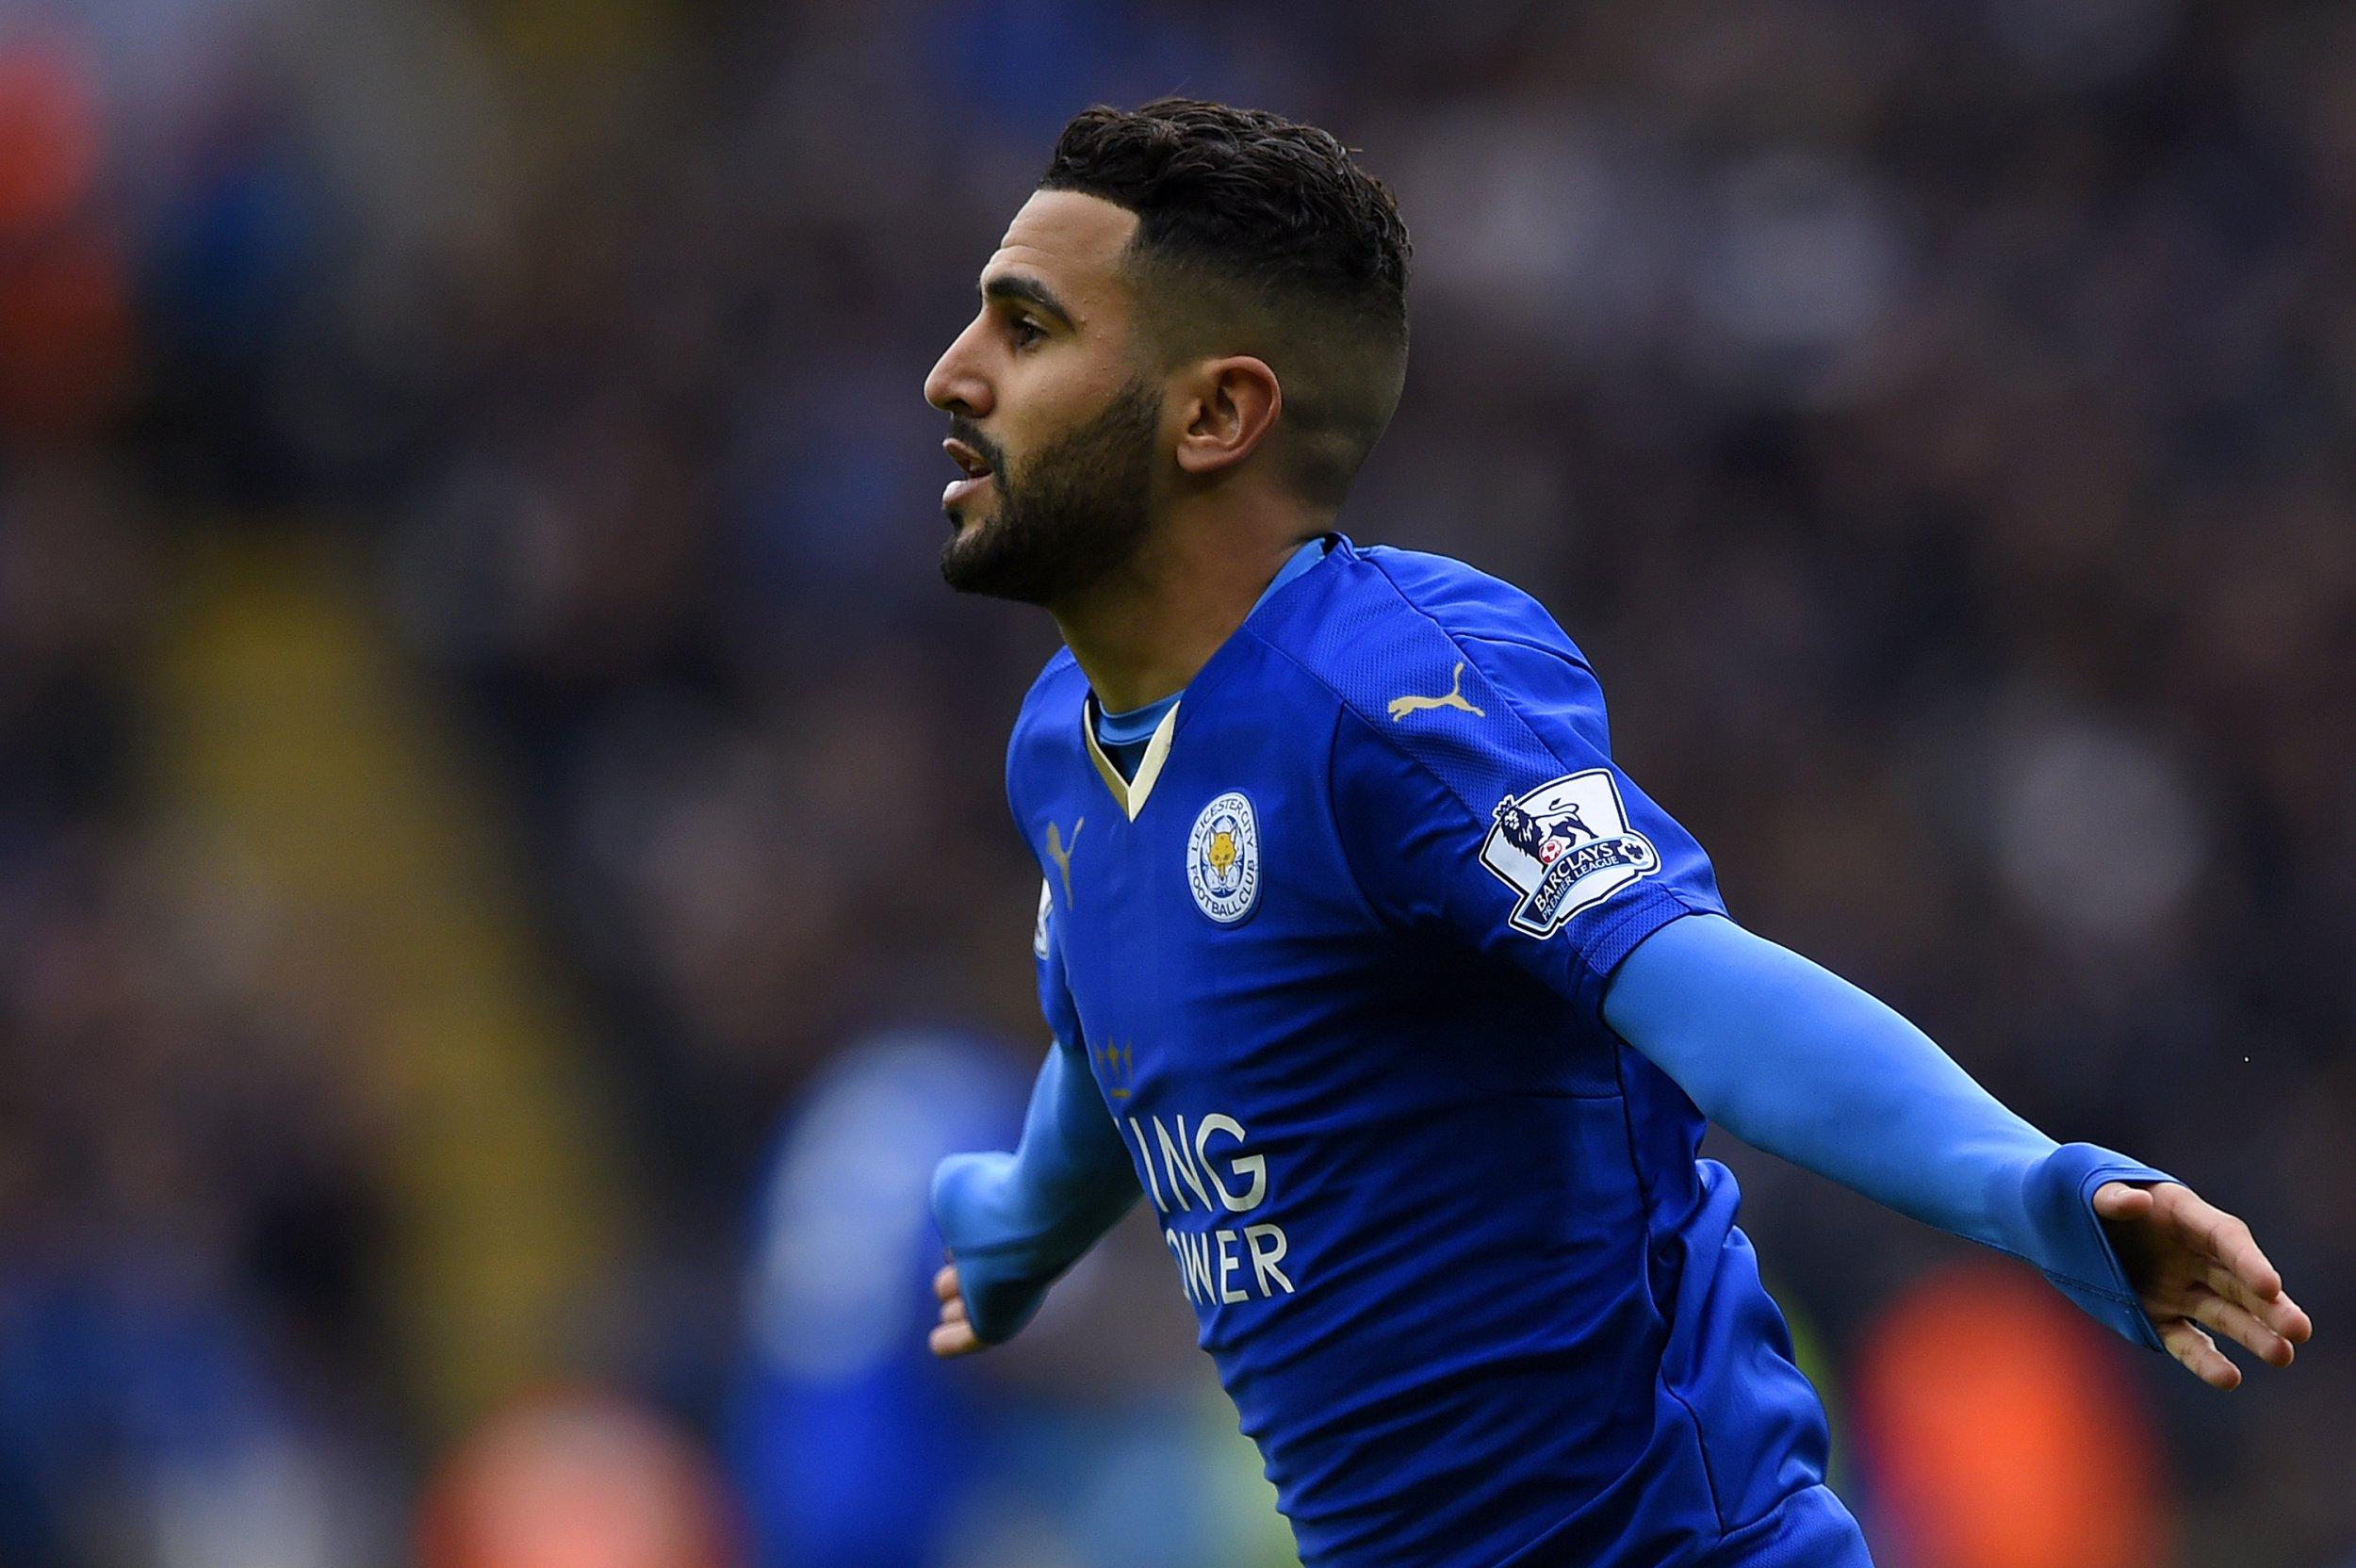 Leicester City player Riyad Mahrez.